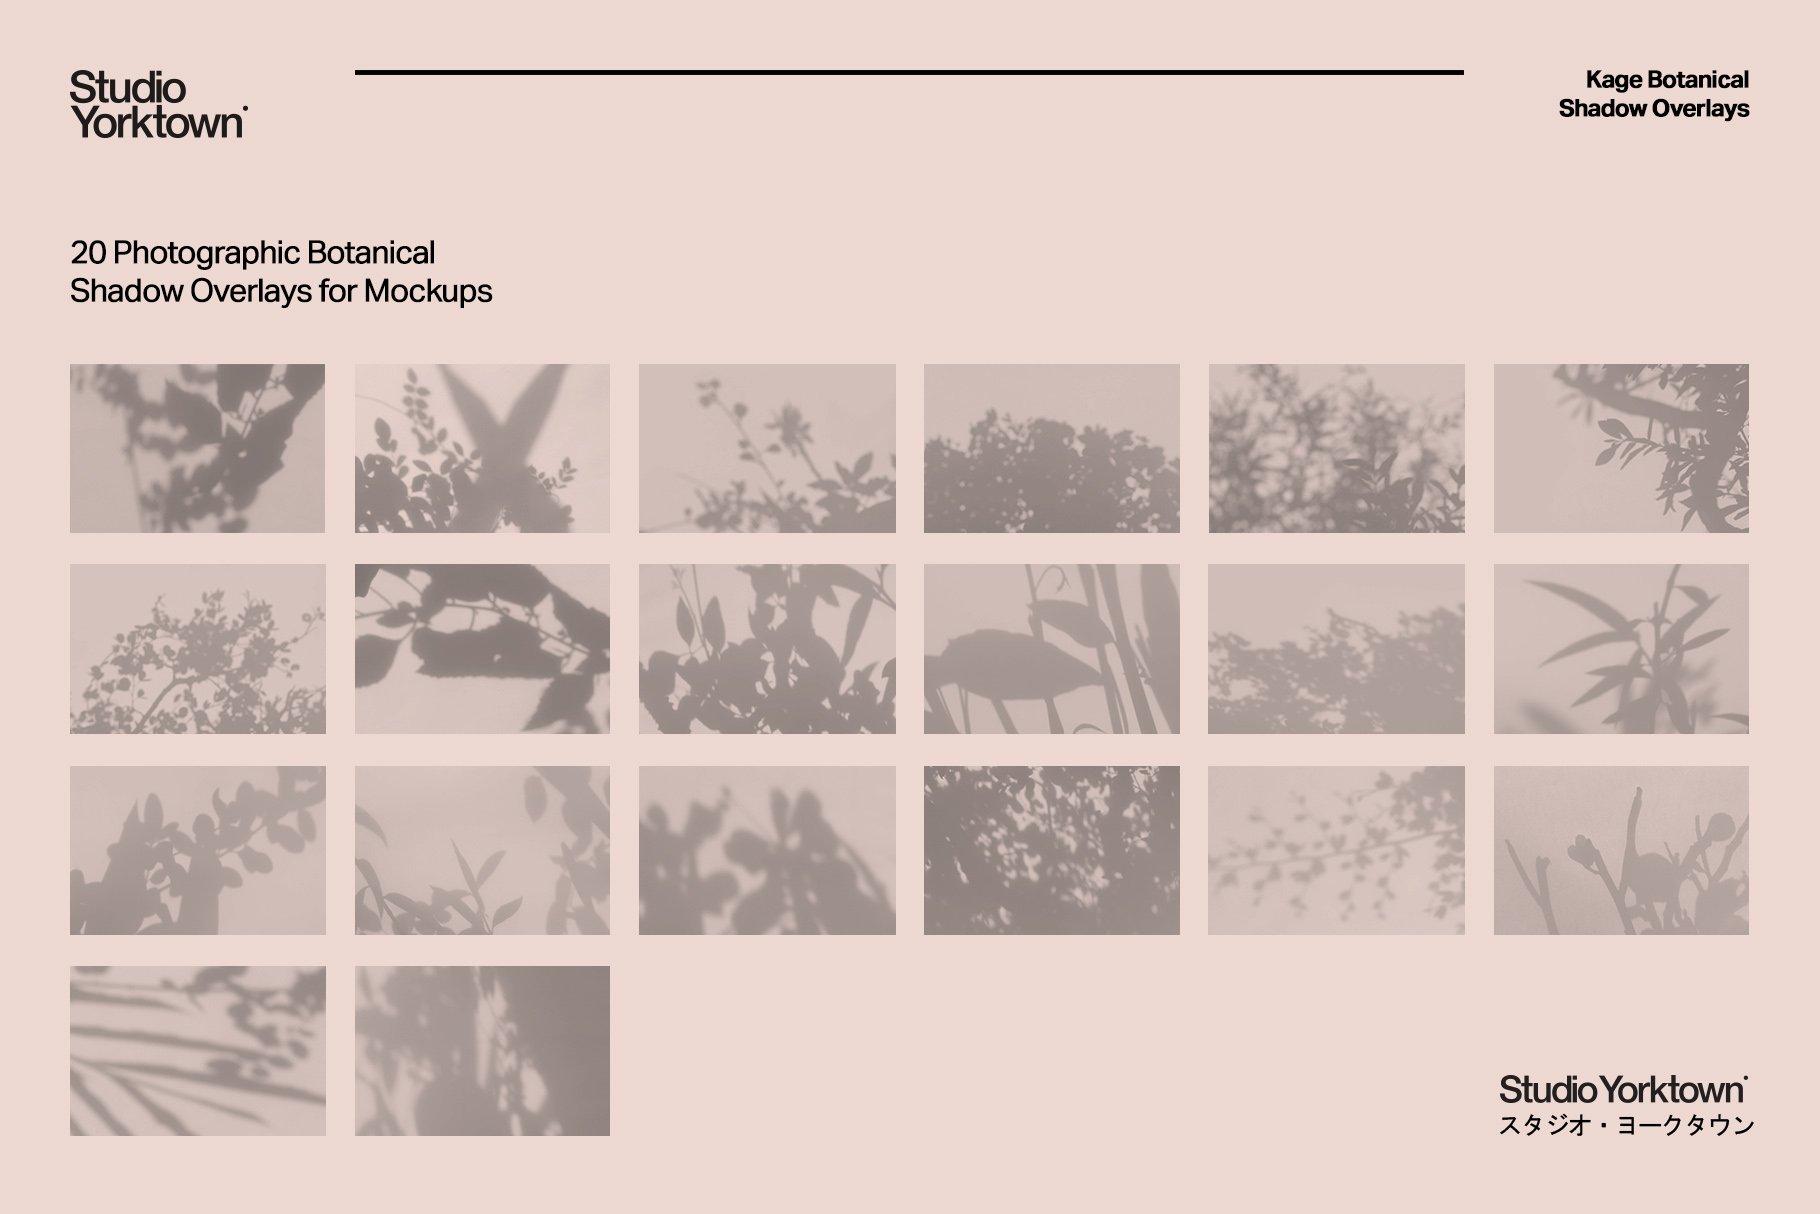 20款高清文艺优雅自然植物阴影投影PNG叠层图片 Kage – Botanical Shadow Overlays插图(1)